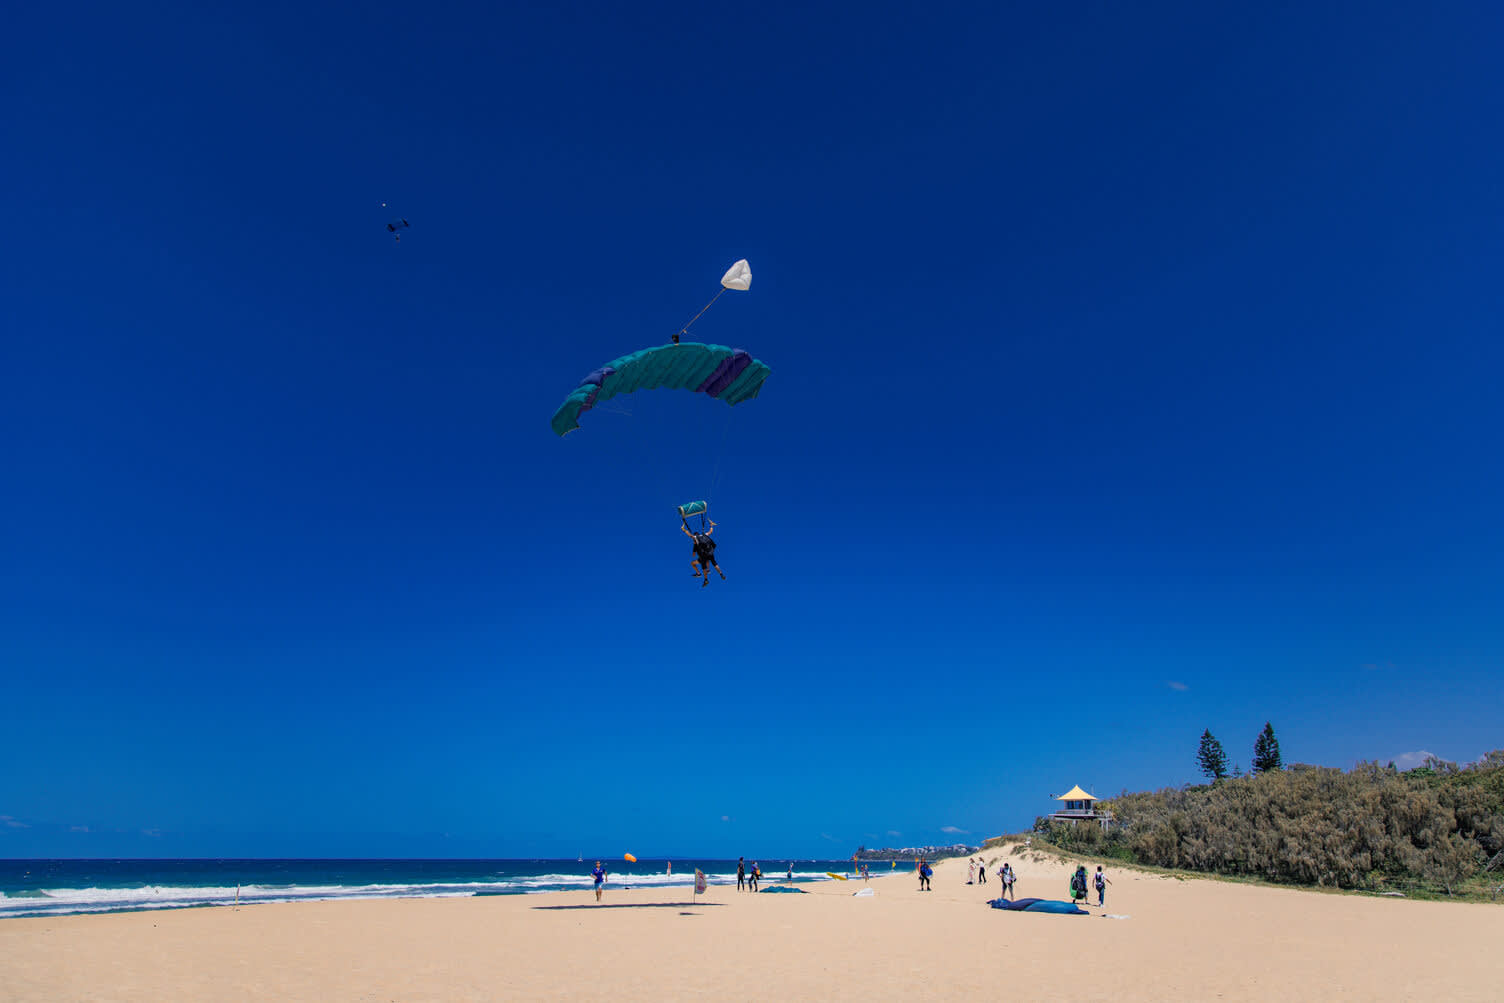 Skydive Caloundra landing at Currimundi Beach